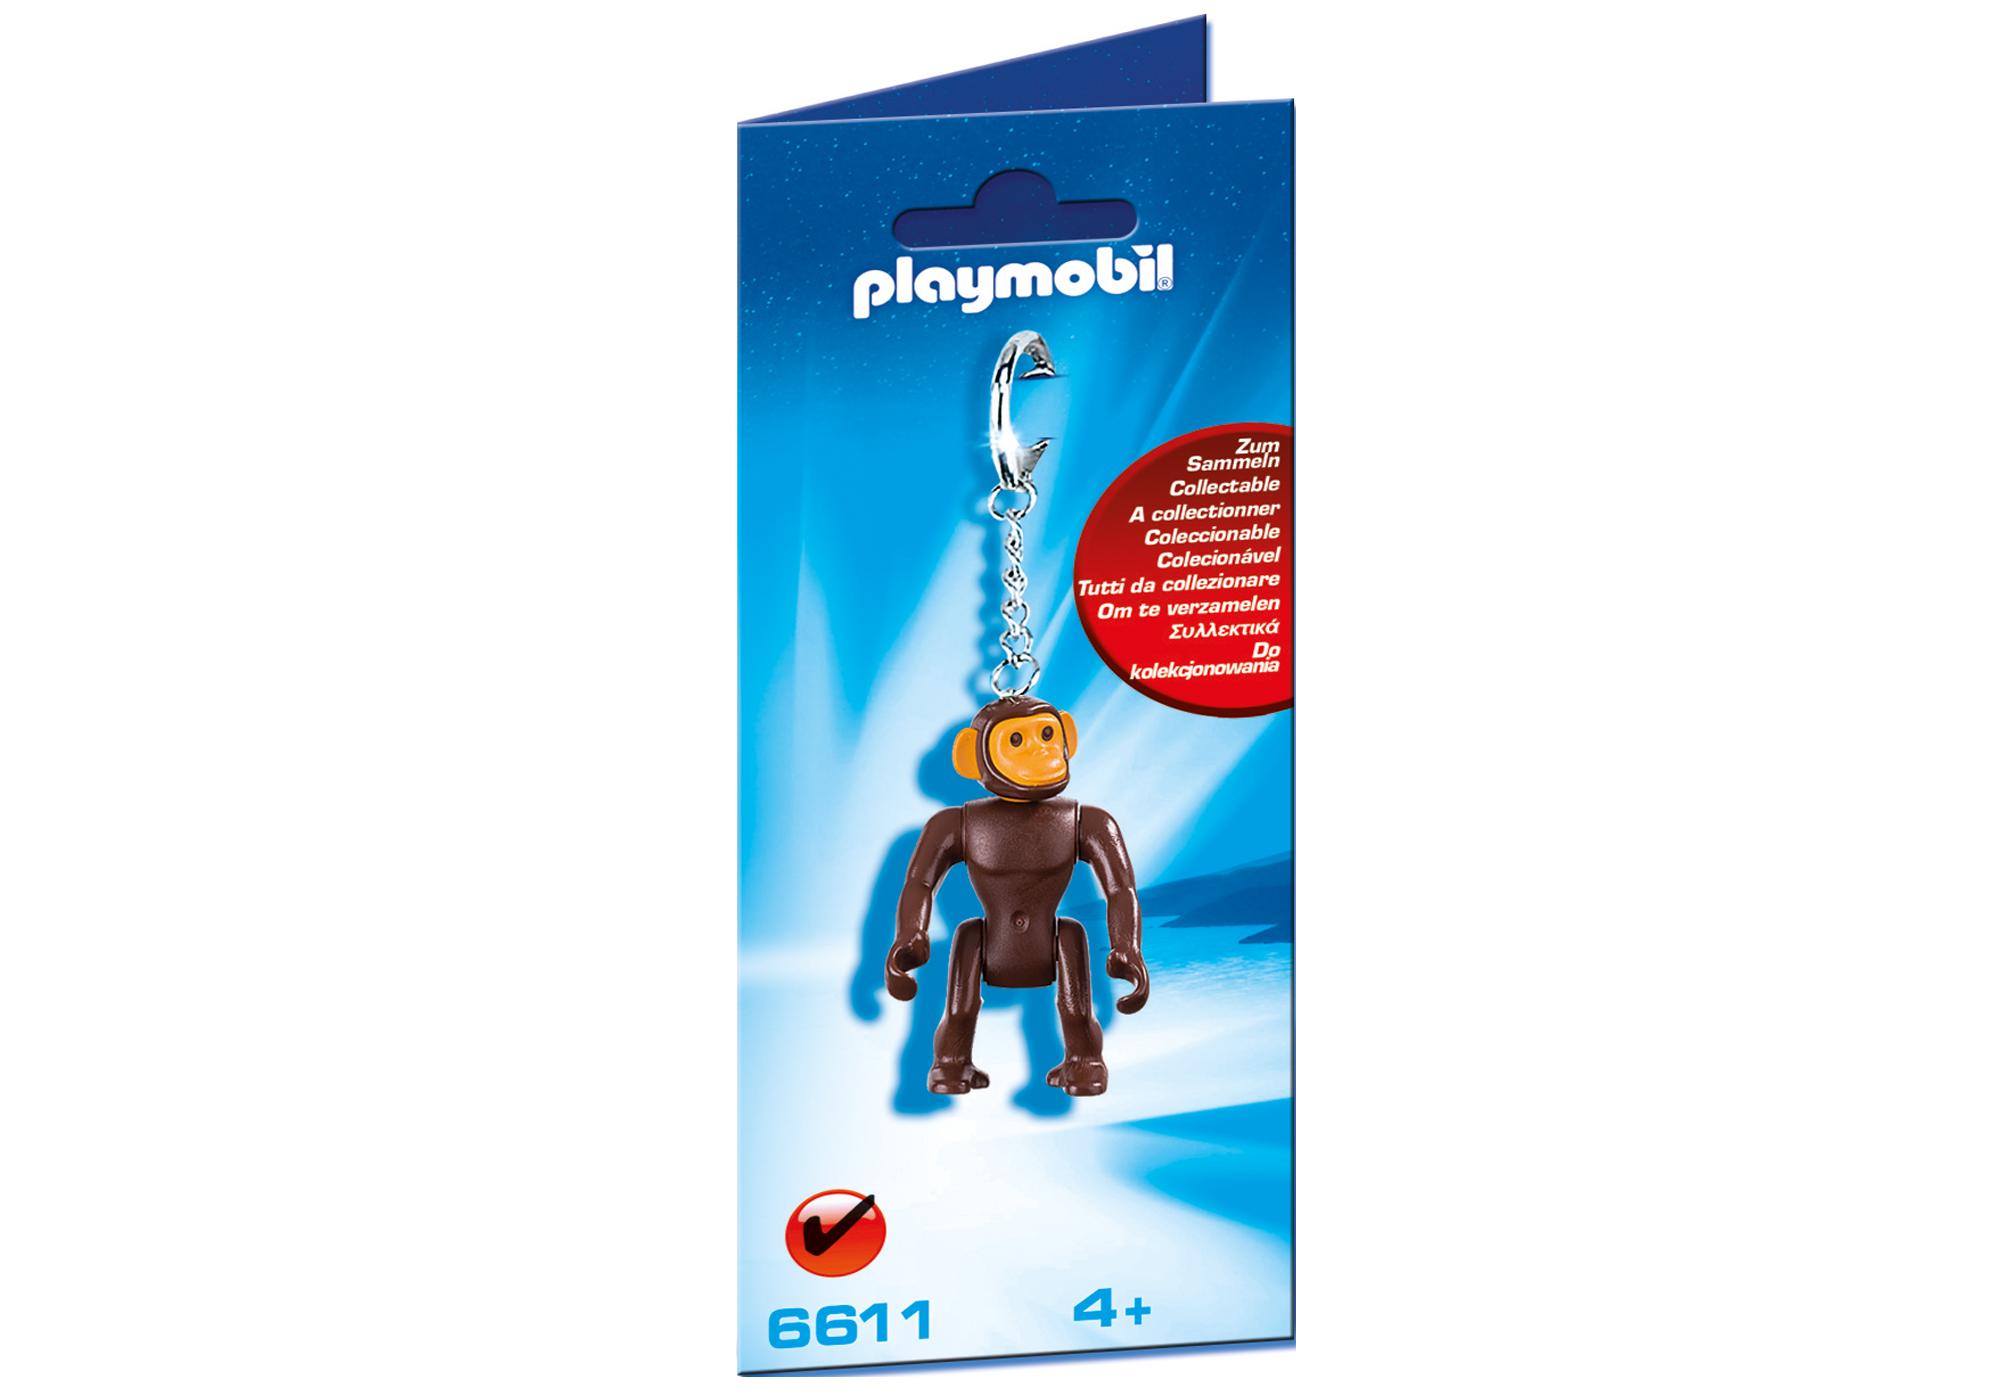 http://media.playmobil.com/i/playmobil/6611_product_box_front